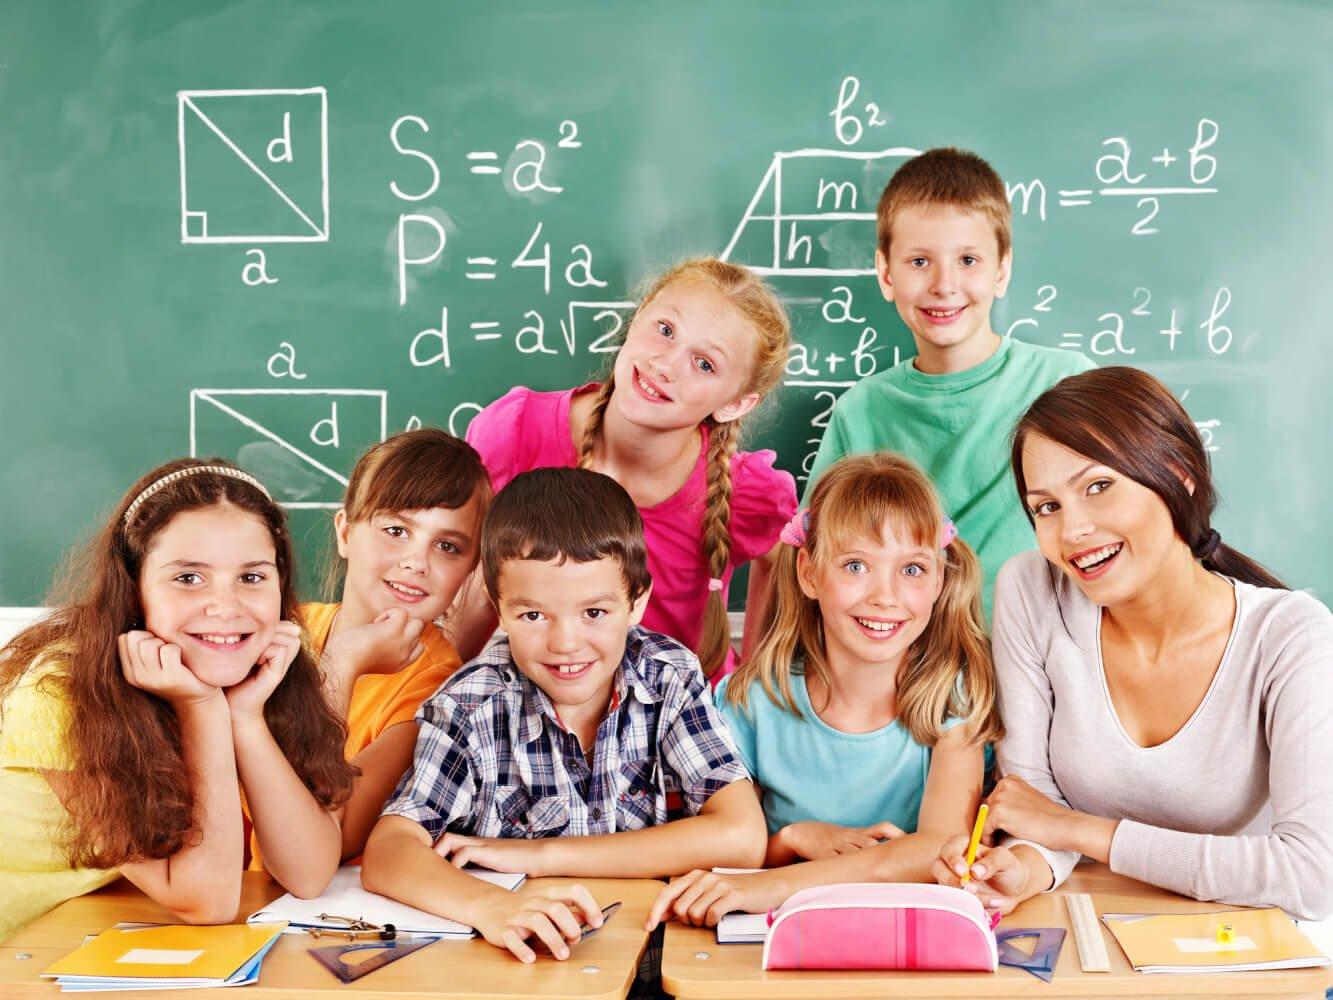 Учителя и дети картинки